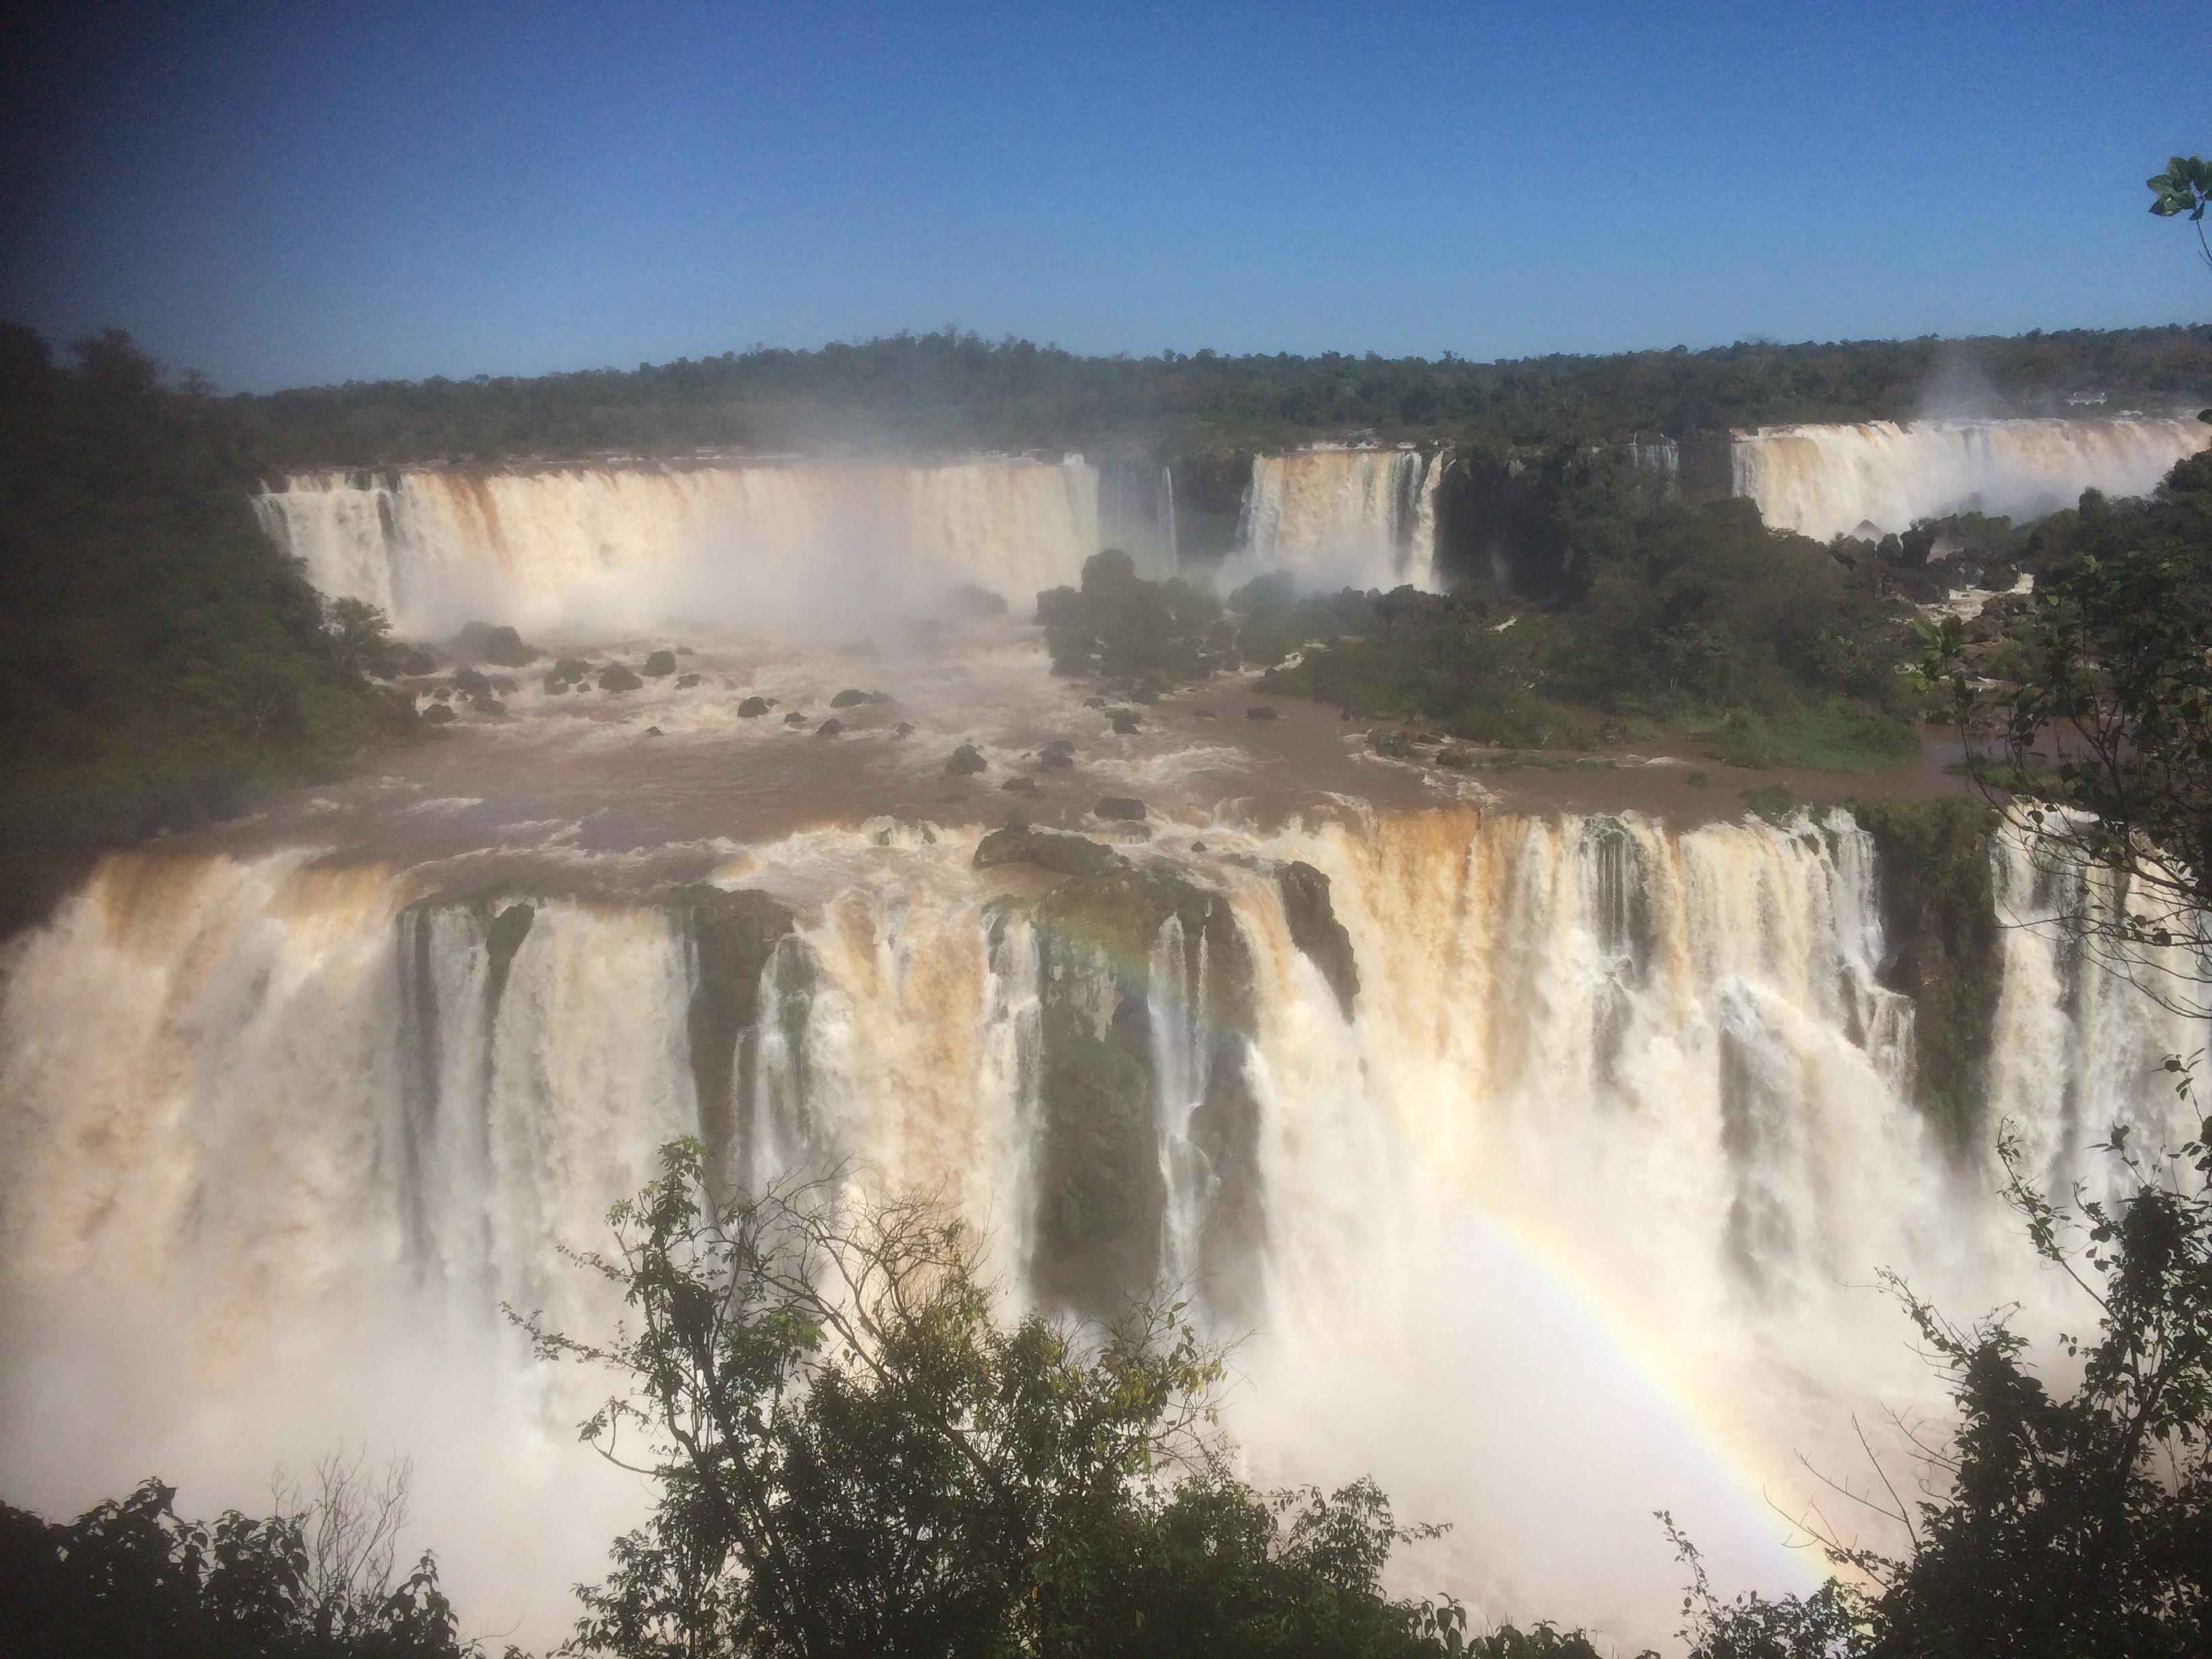 Iguazu Falls Foz do Iguacu